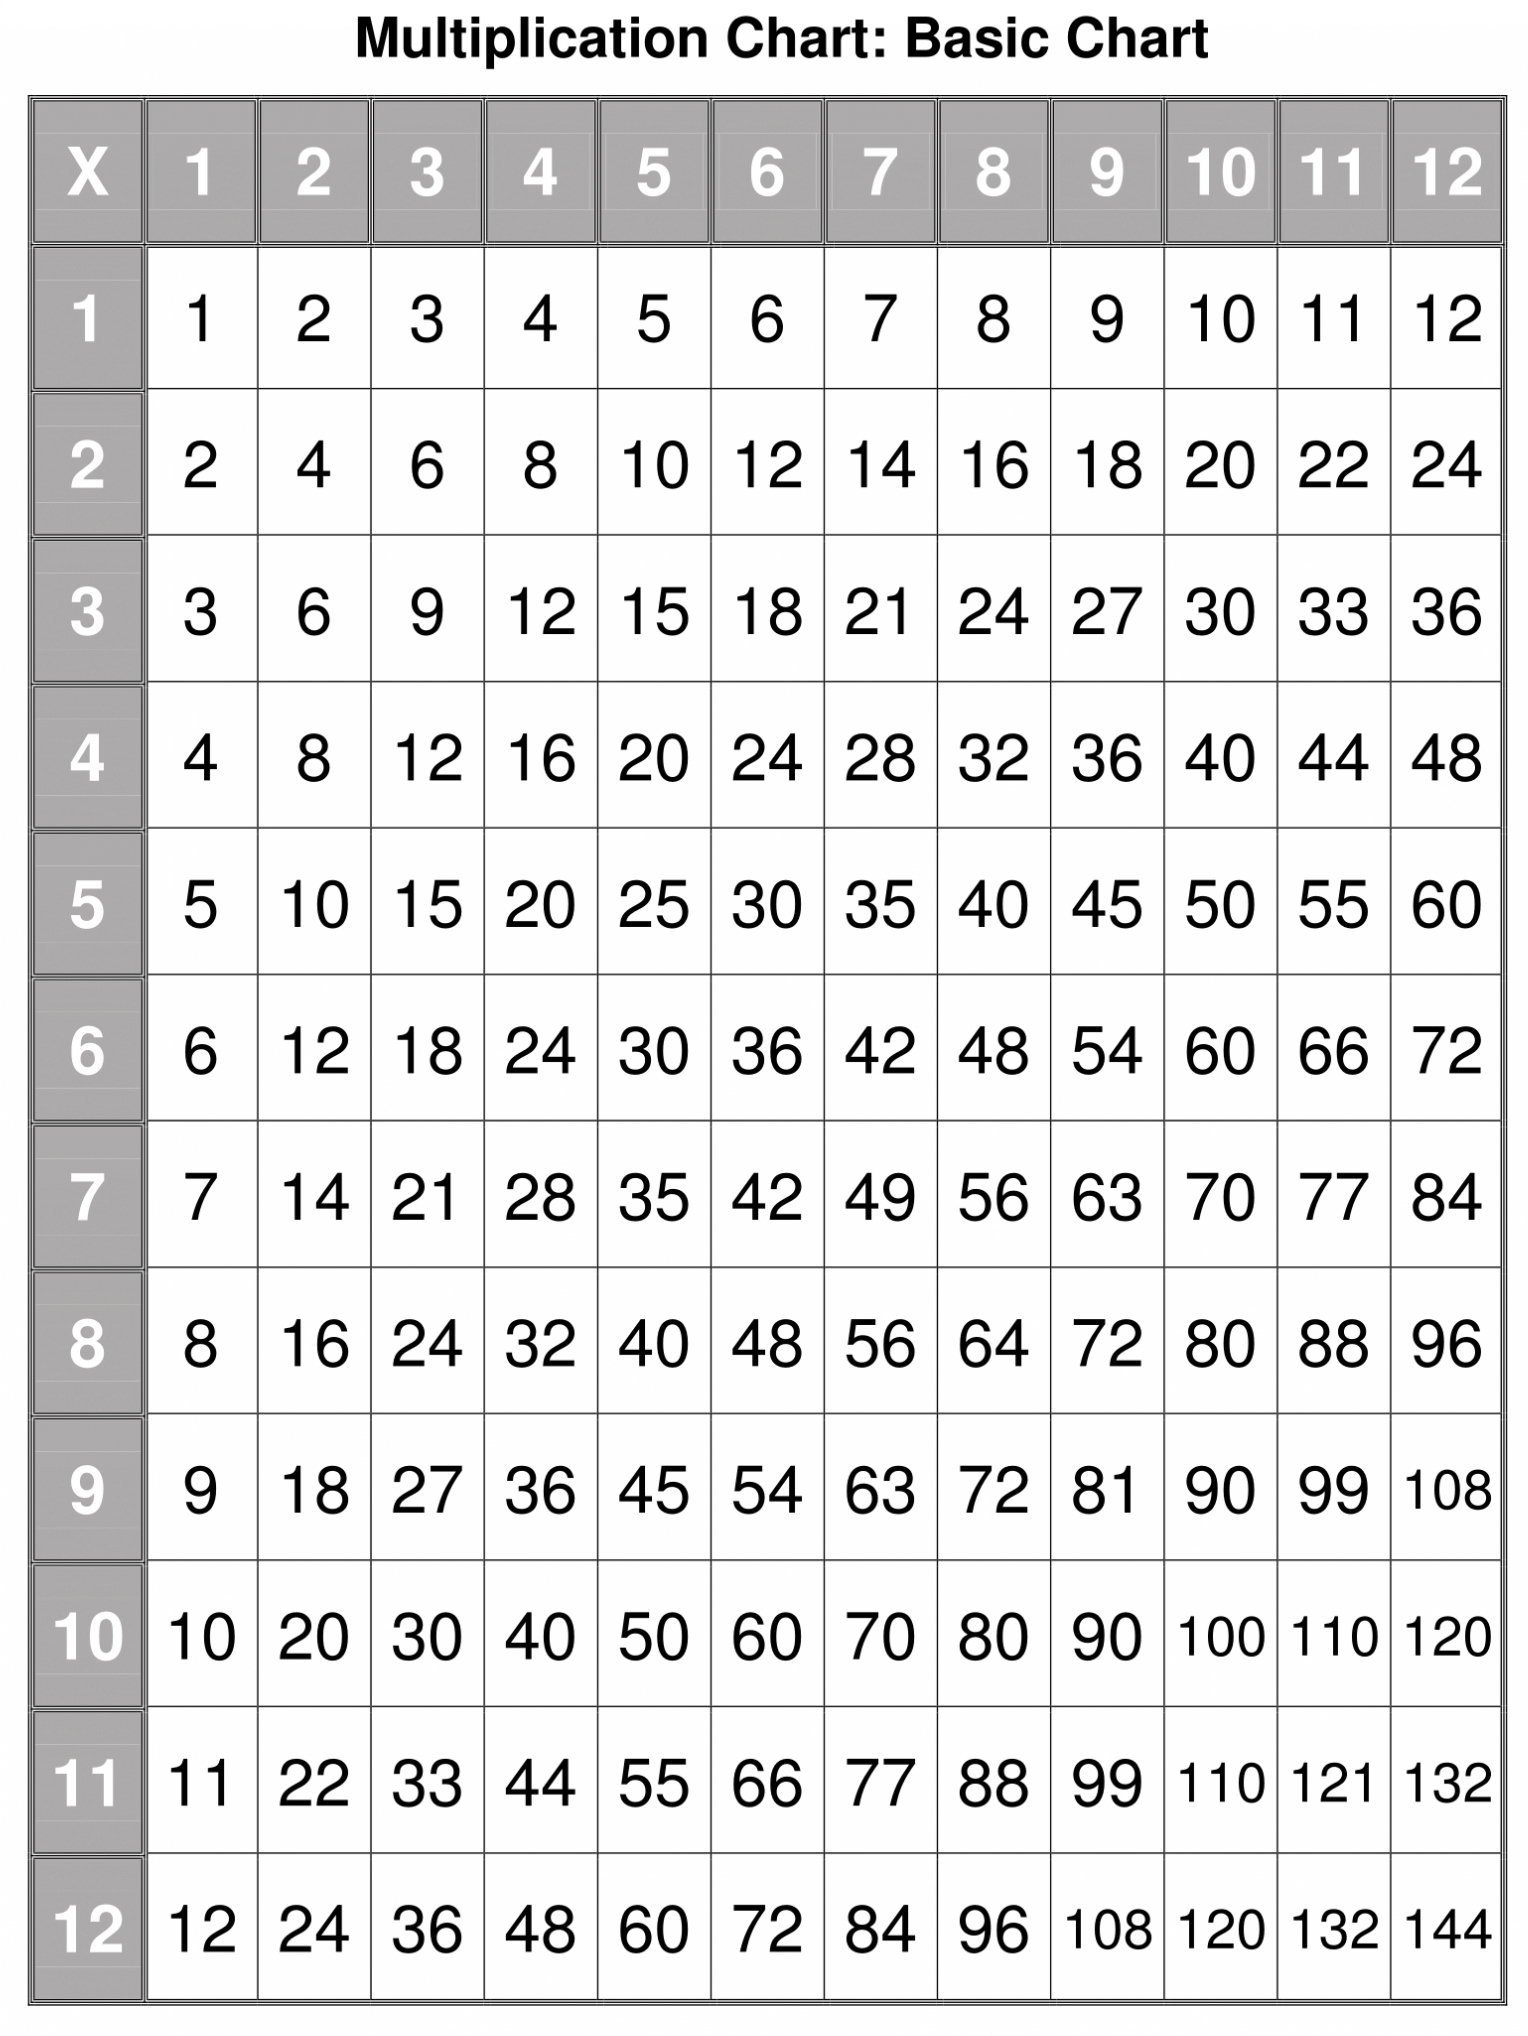 Printable Multiplication Table Pdf | Multiplication Charts throughout A Printable Multiplication Chart